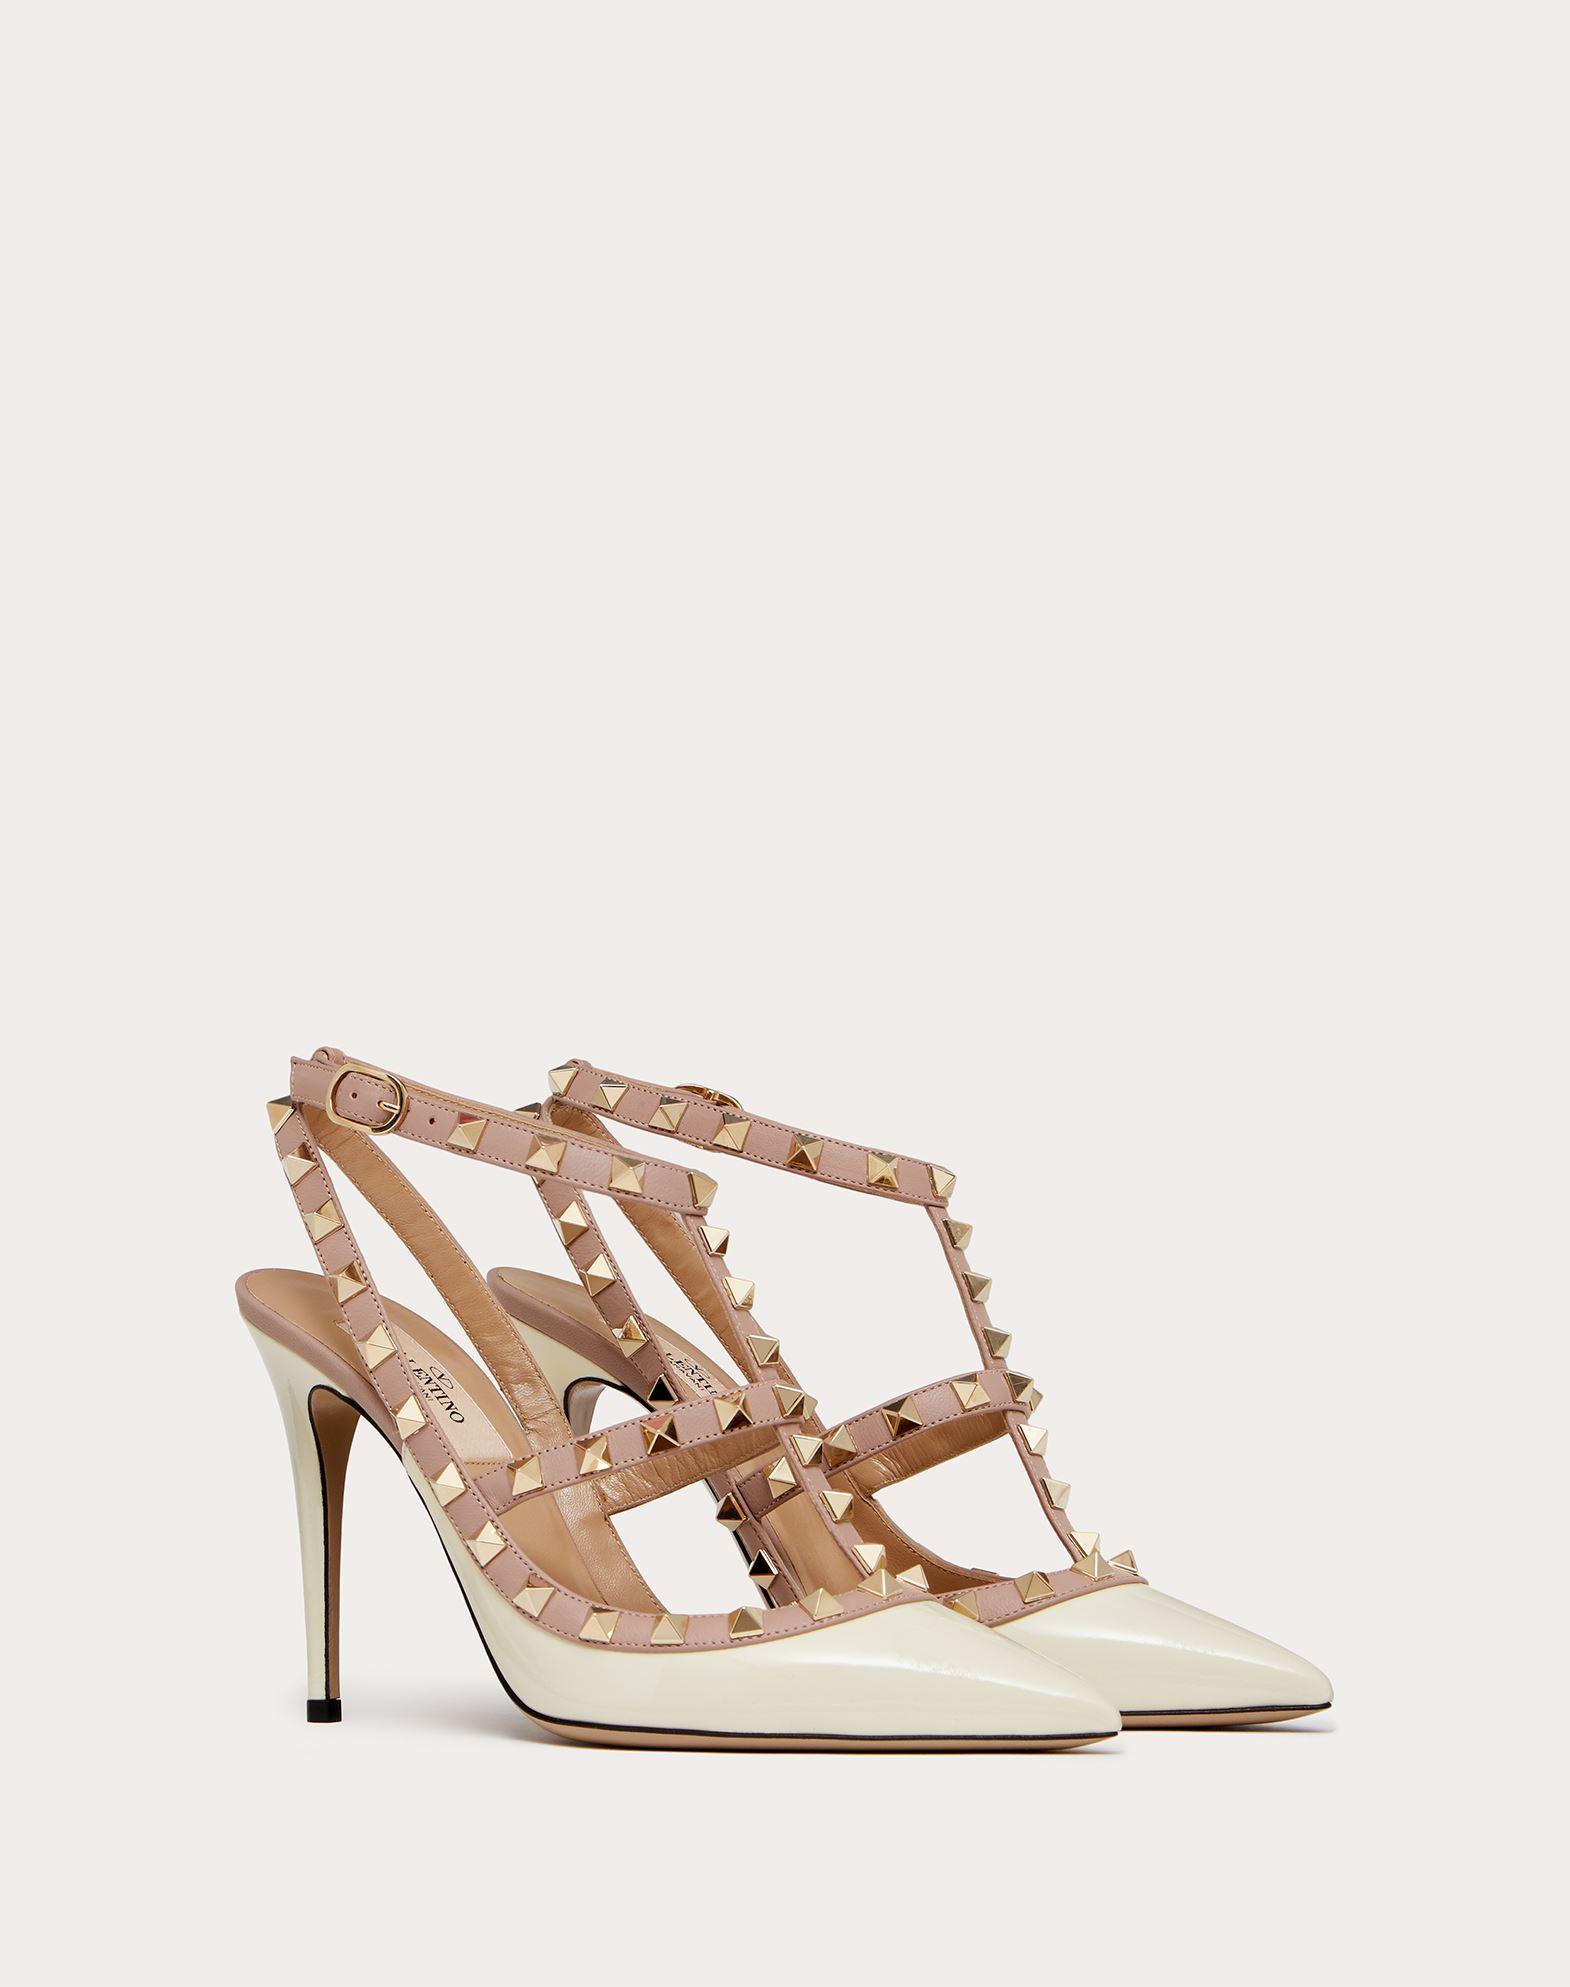 VALENTINO GARAVANI Rockstud Ankle Strap Pump HIGH HEEL PUMPS D r